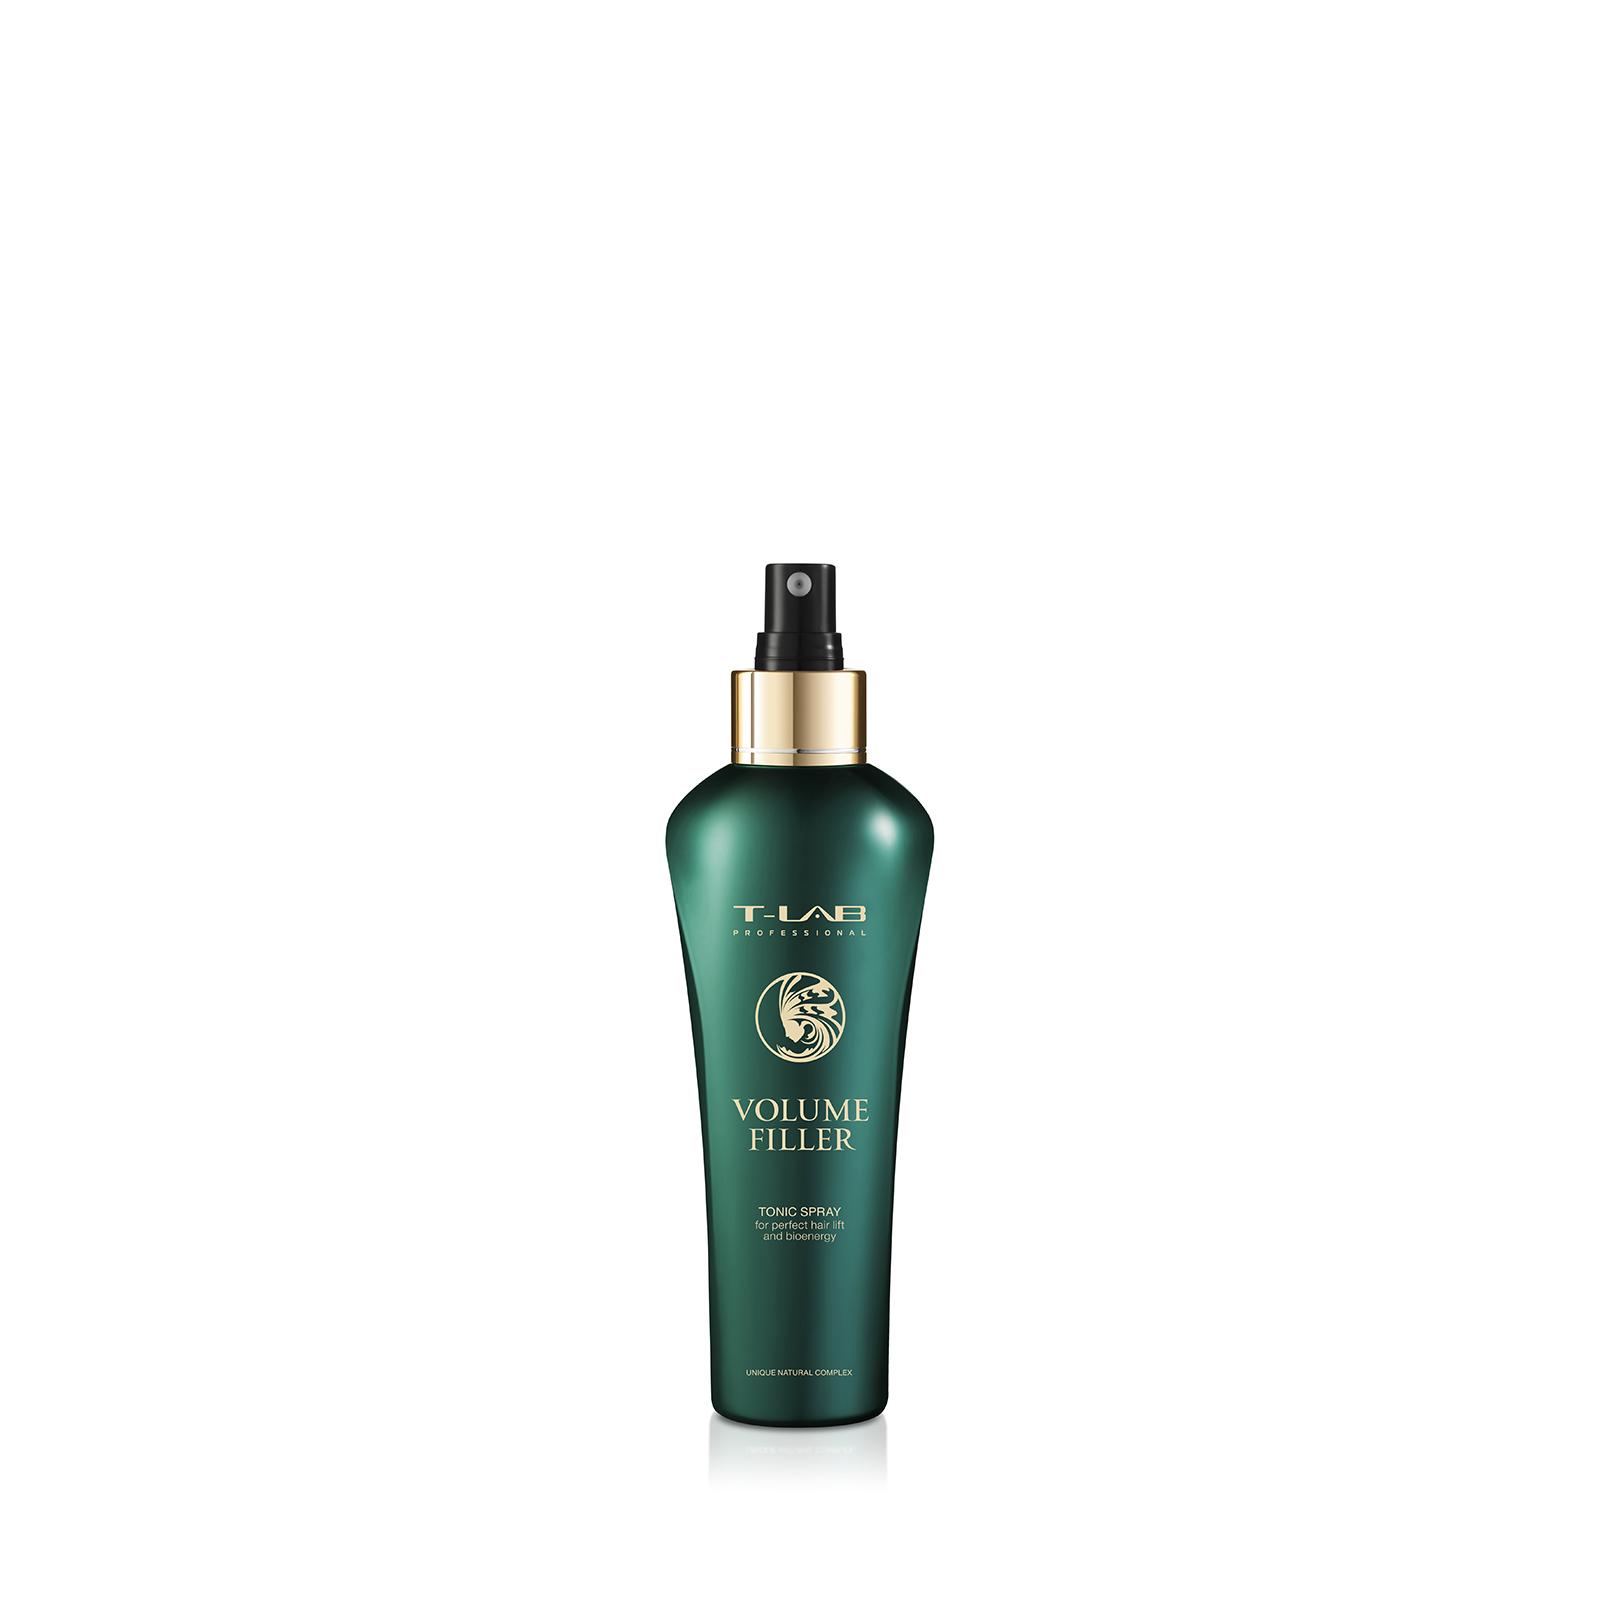 T-Lab Professional - Volume Filler Tonic Spray